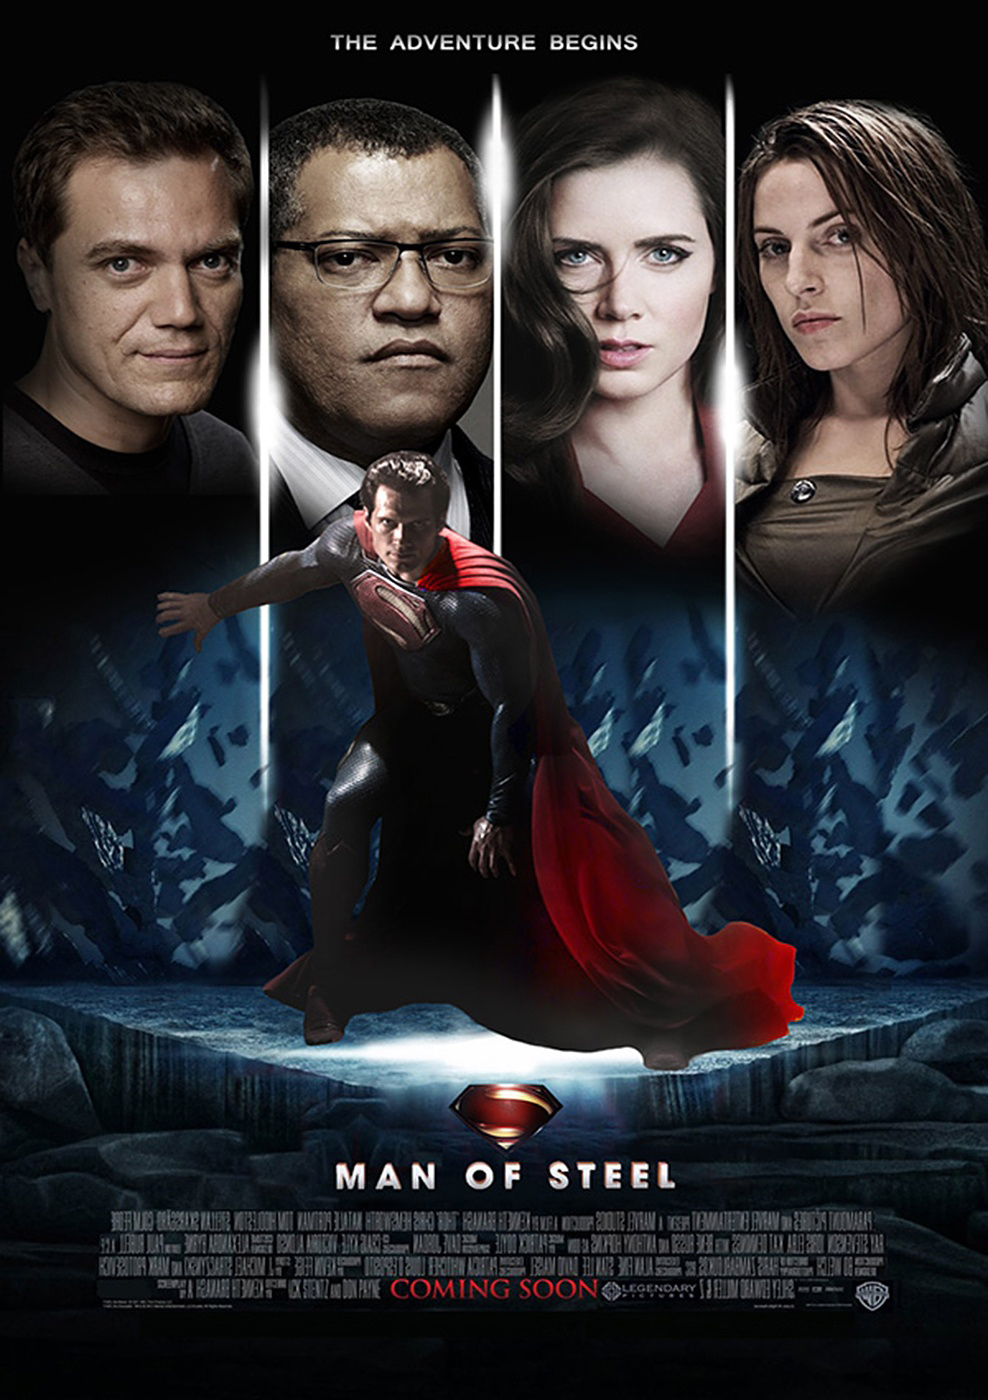 Man of Steel - Movie Poster #4 (Original)